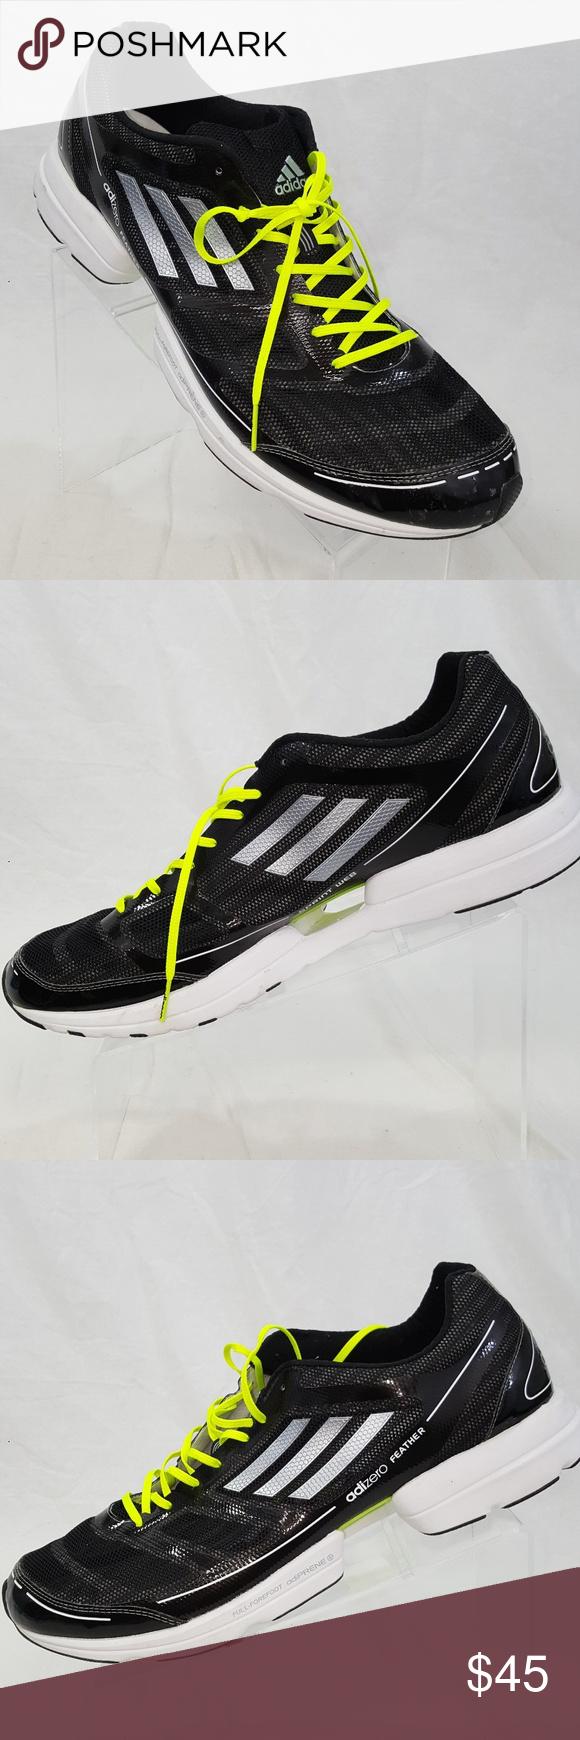 Adidas adizero Feather corriendo adidas negro Silver SZ 14 adidas corriendo adizero 712cbe